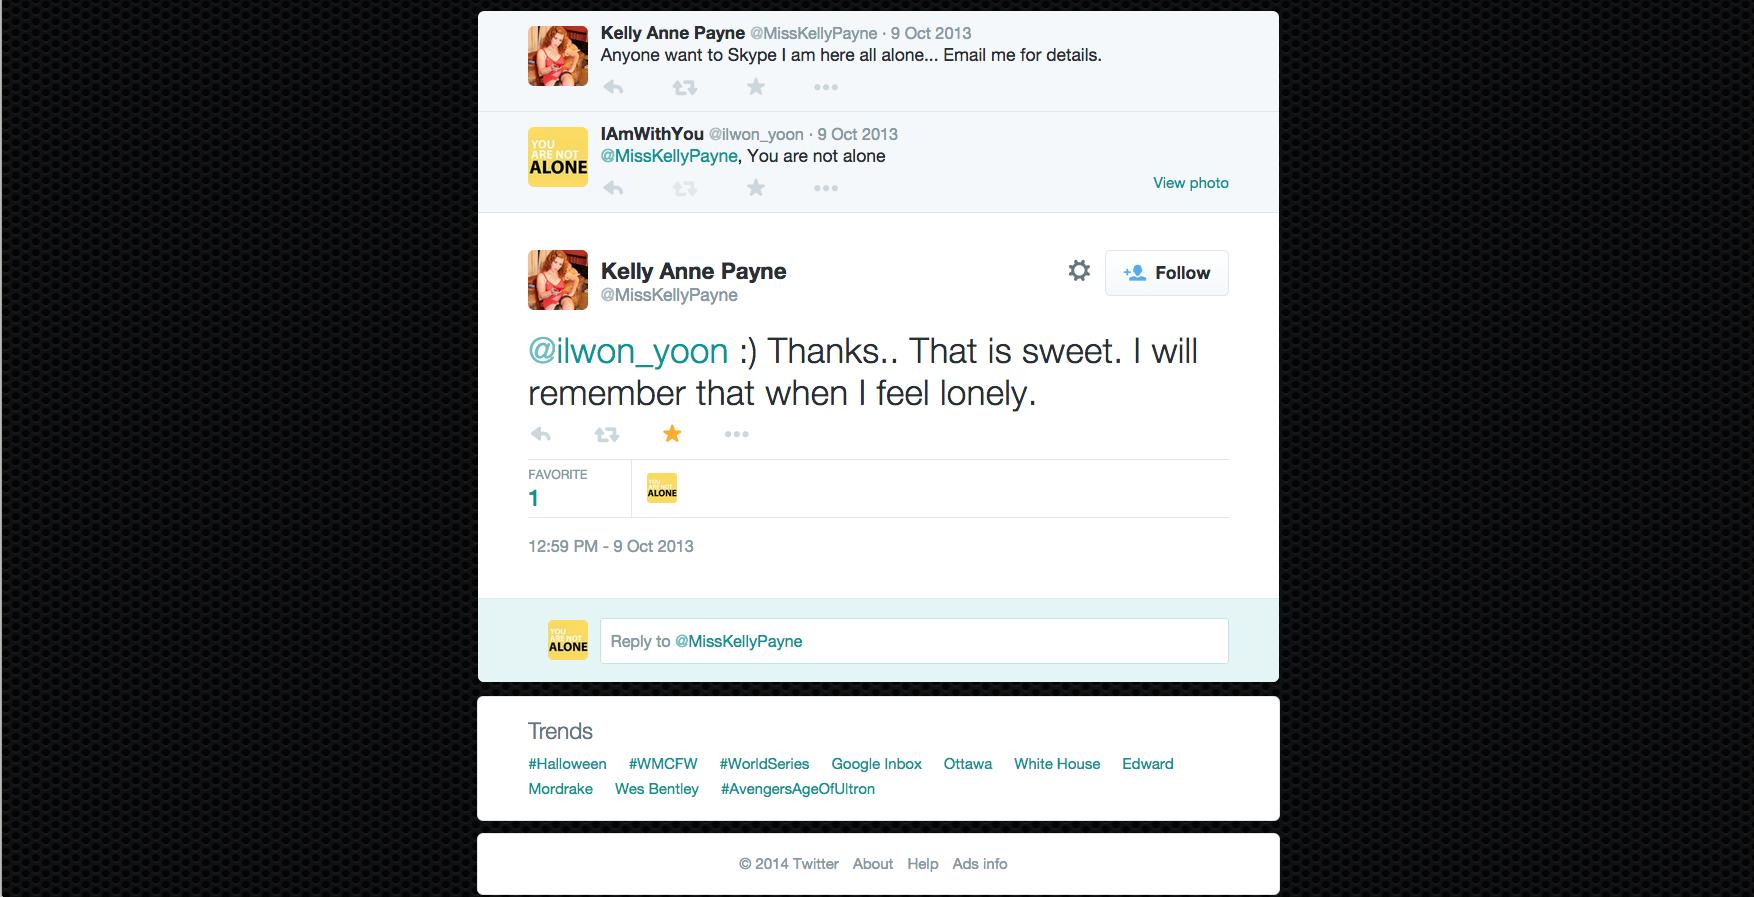 Screenshot 2014-10-22 23.26.04.png